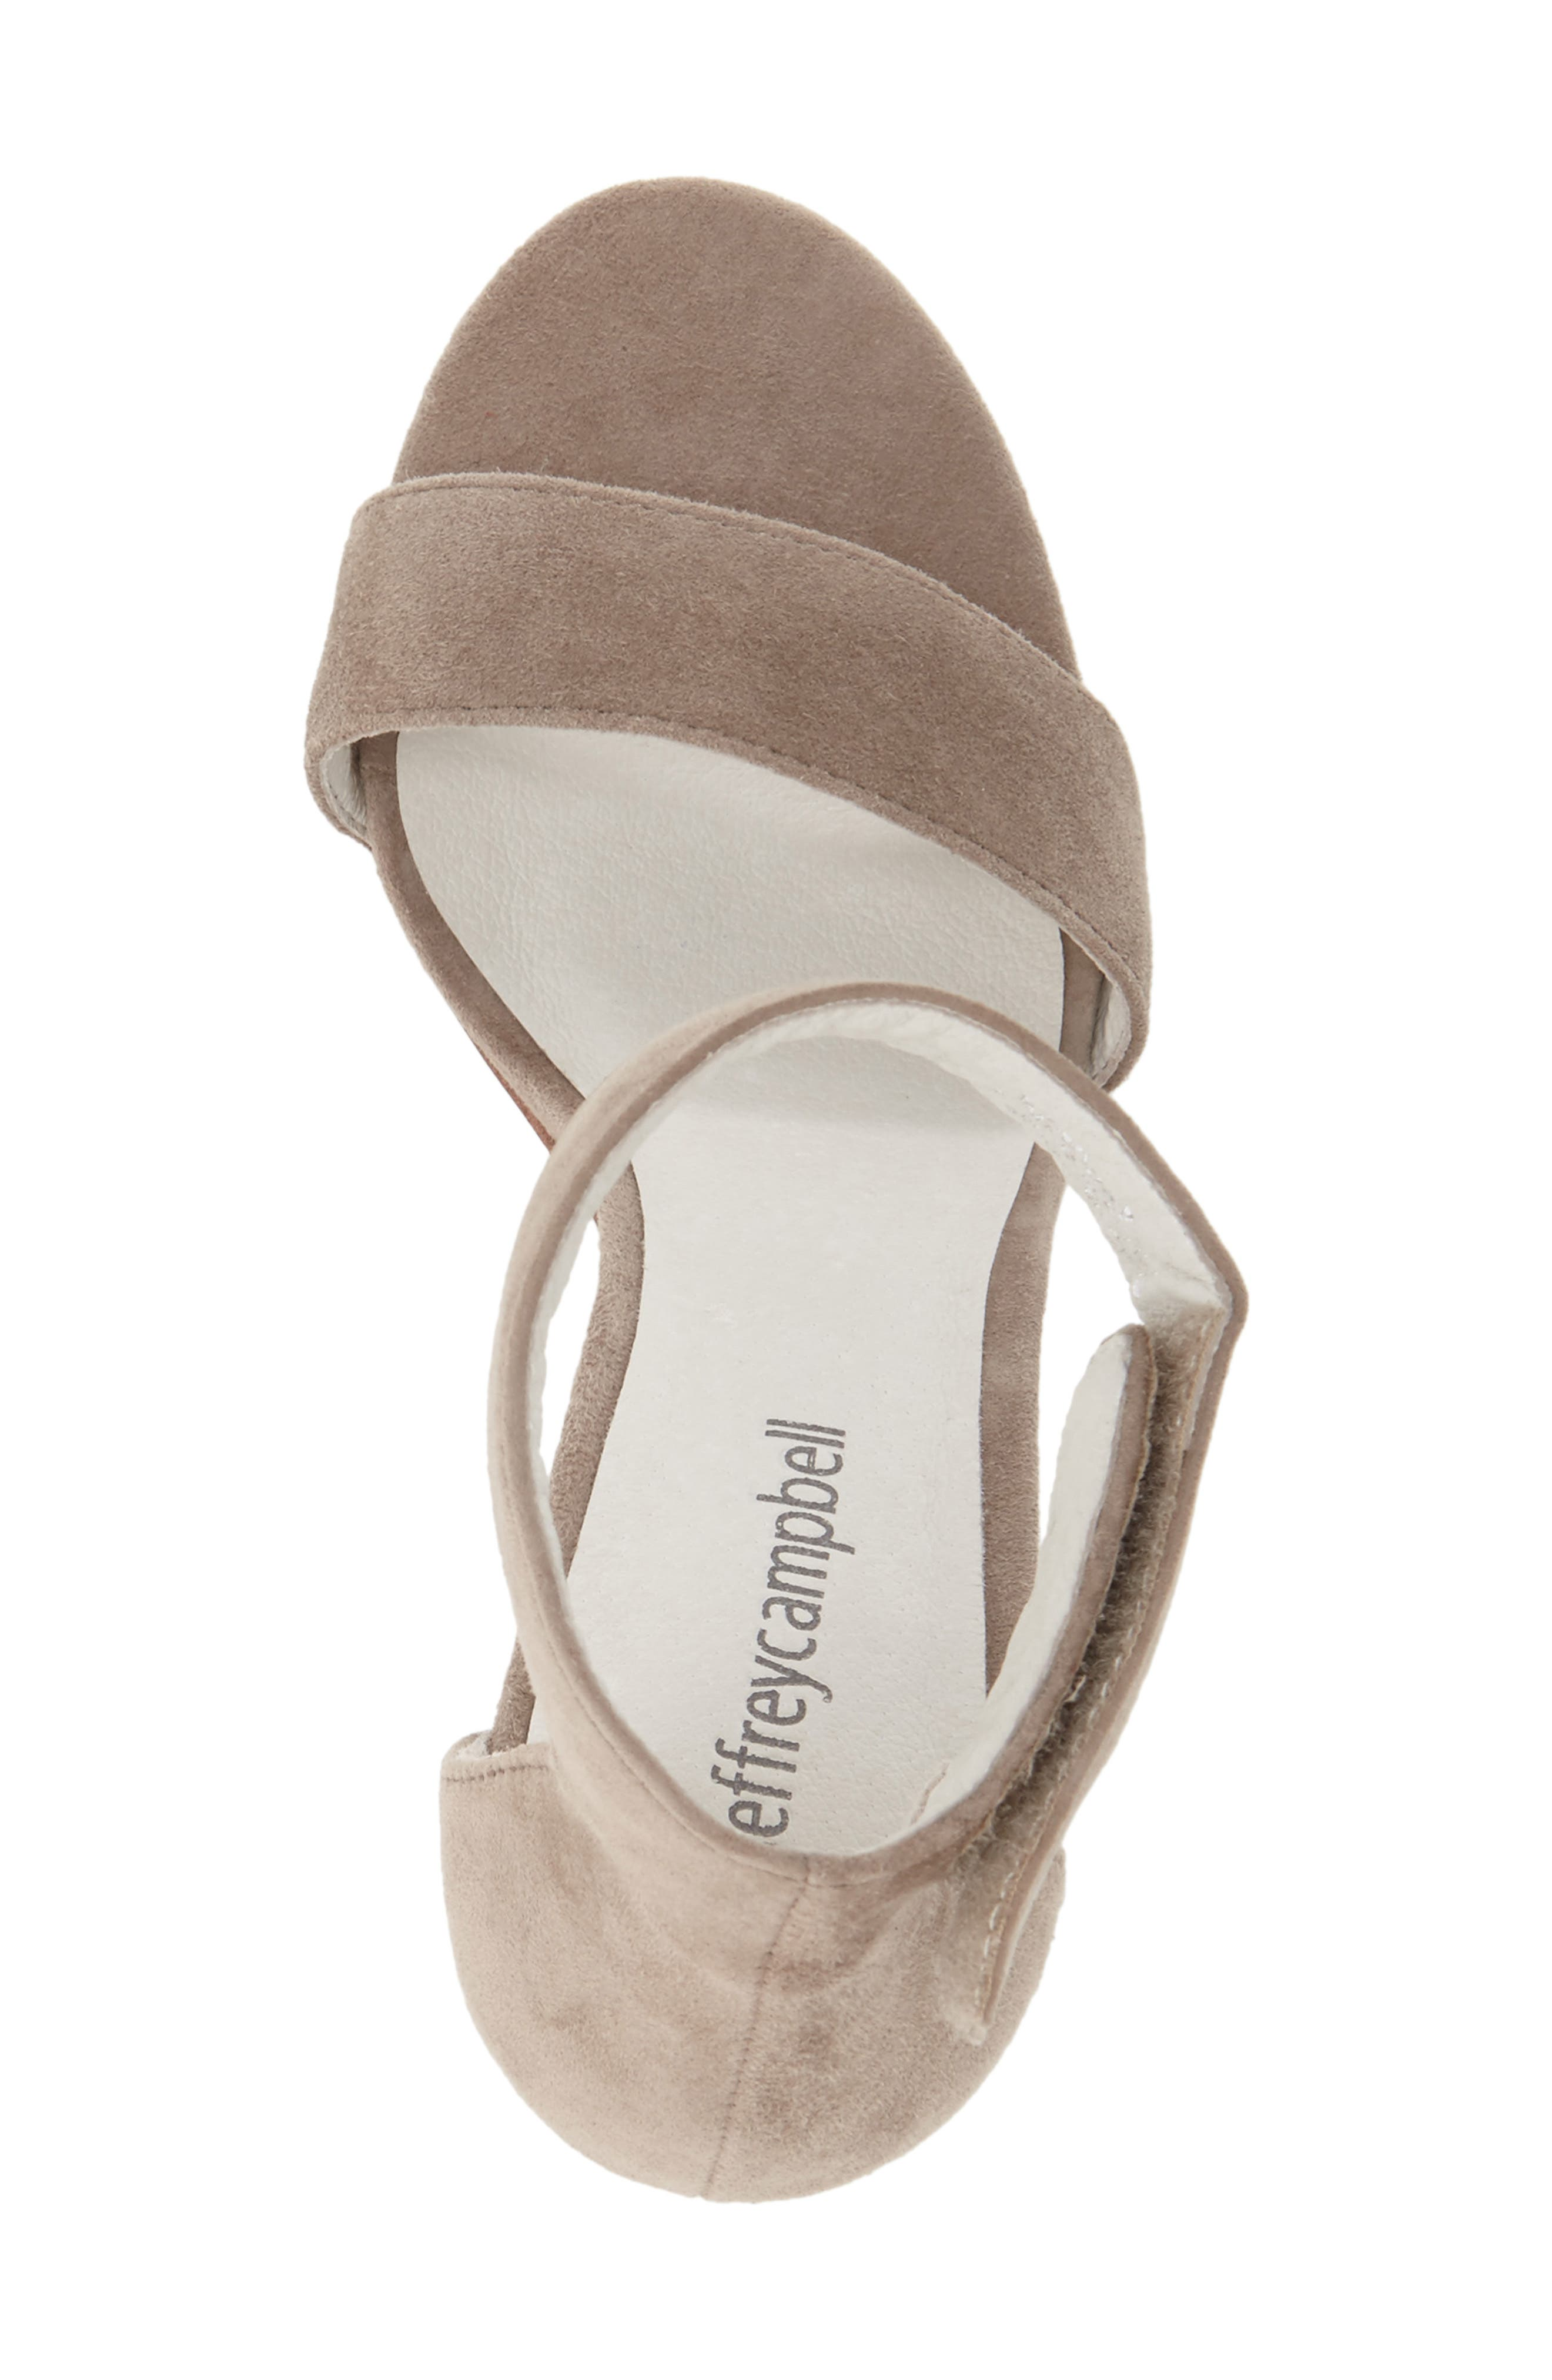 JEFFREY CAMPBELL, Lindsay Ankle Strap Sandal, Alternate thumbnail 3, color, TAUPE SUEDE